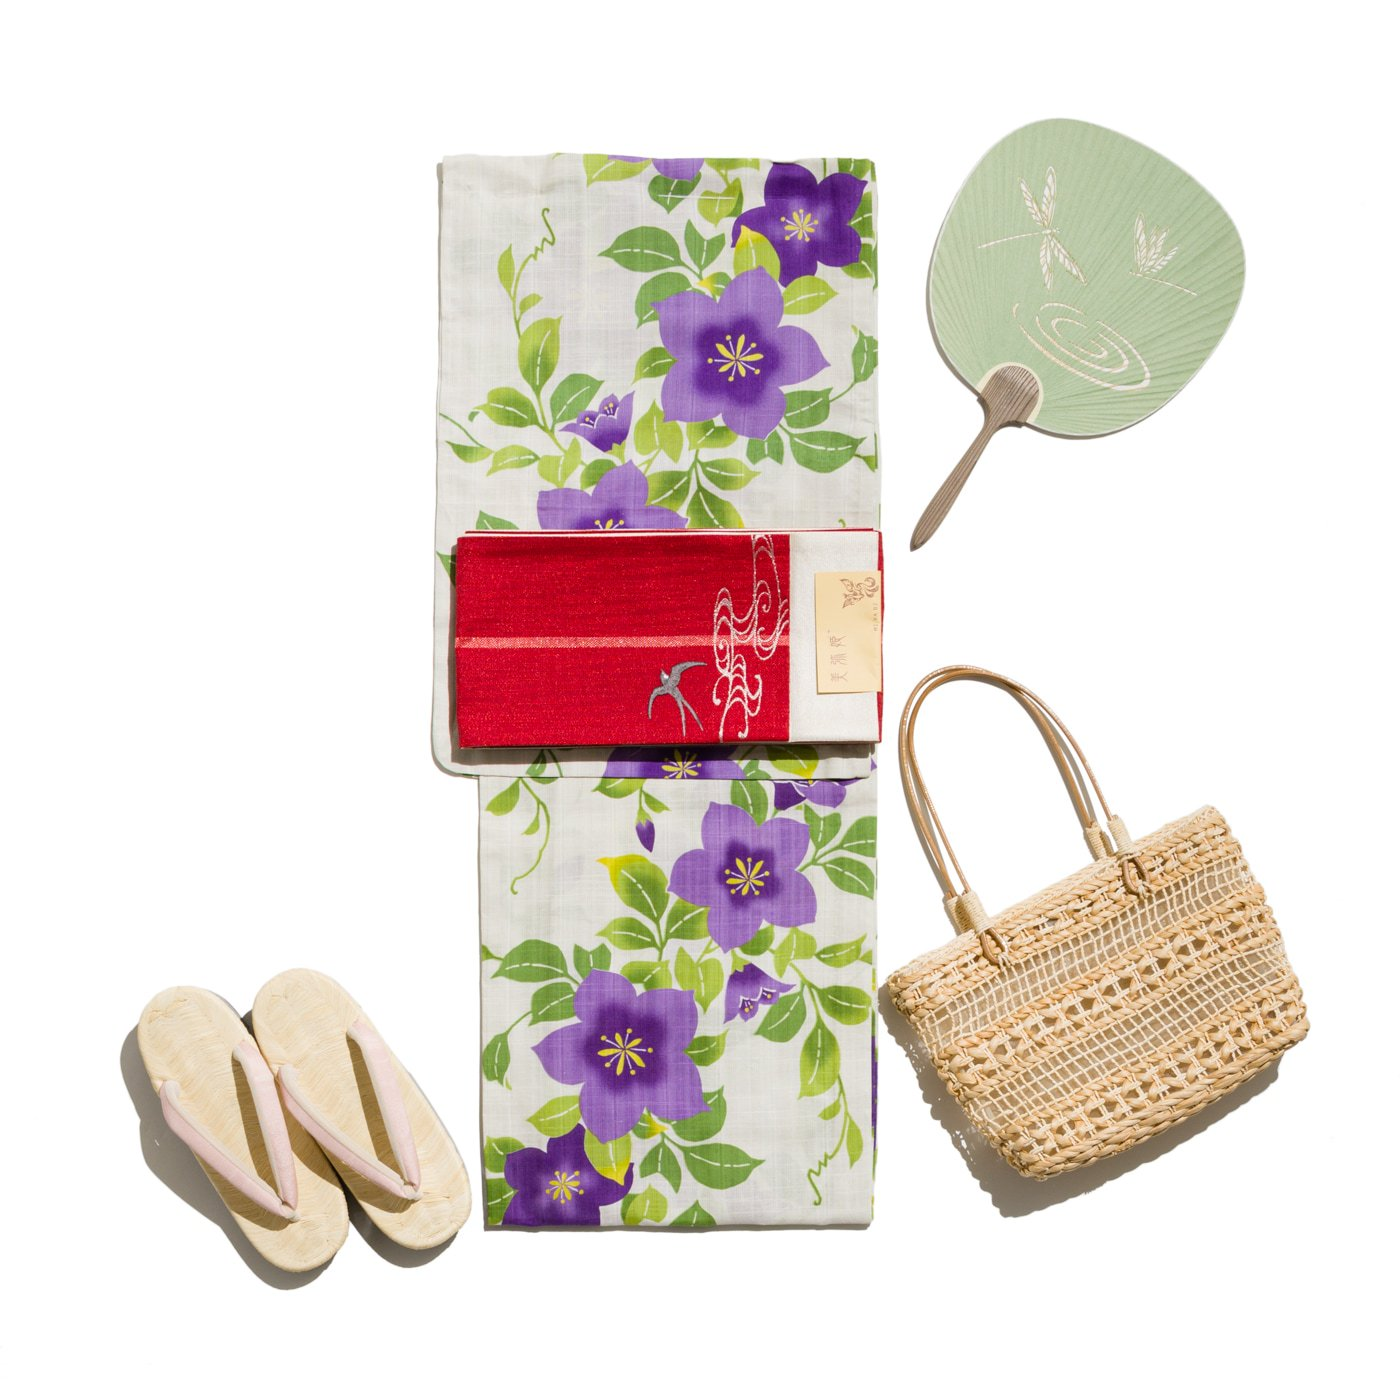 「新品浴衣 桔梗 ViVi」の商品画像